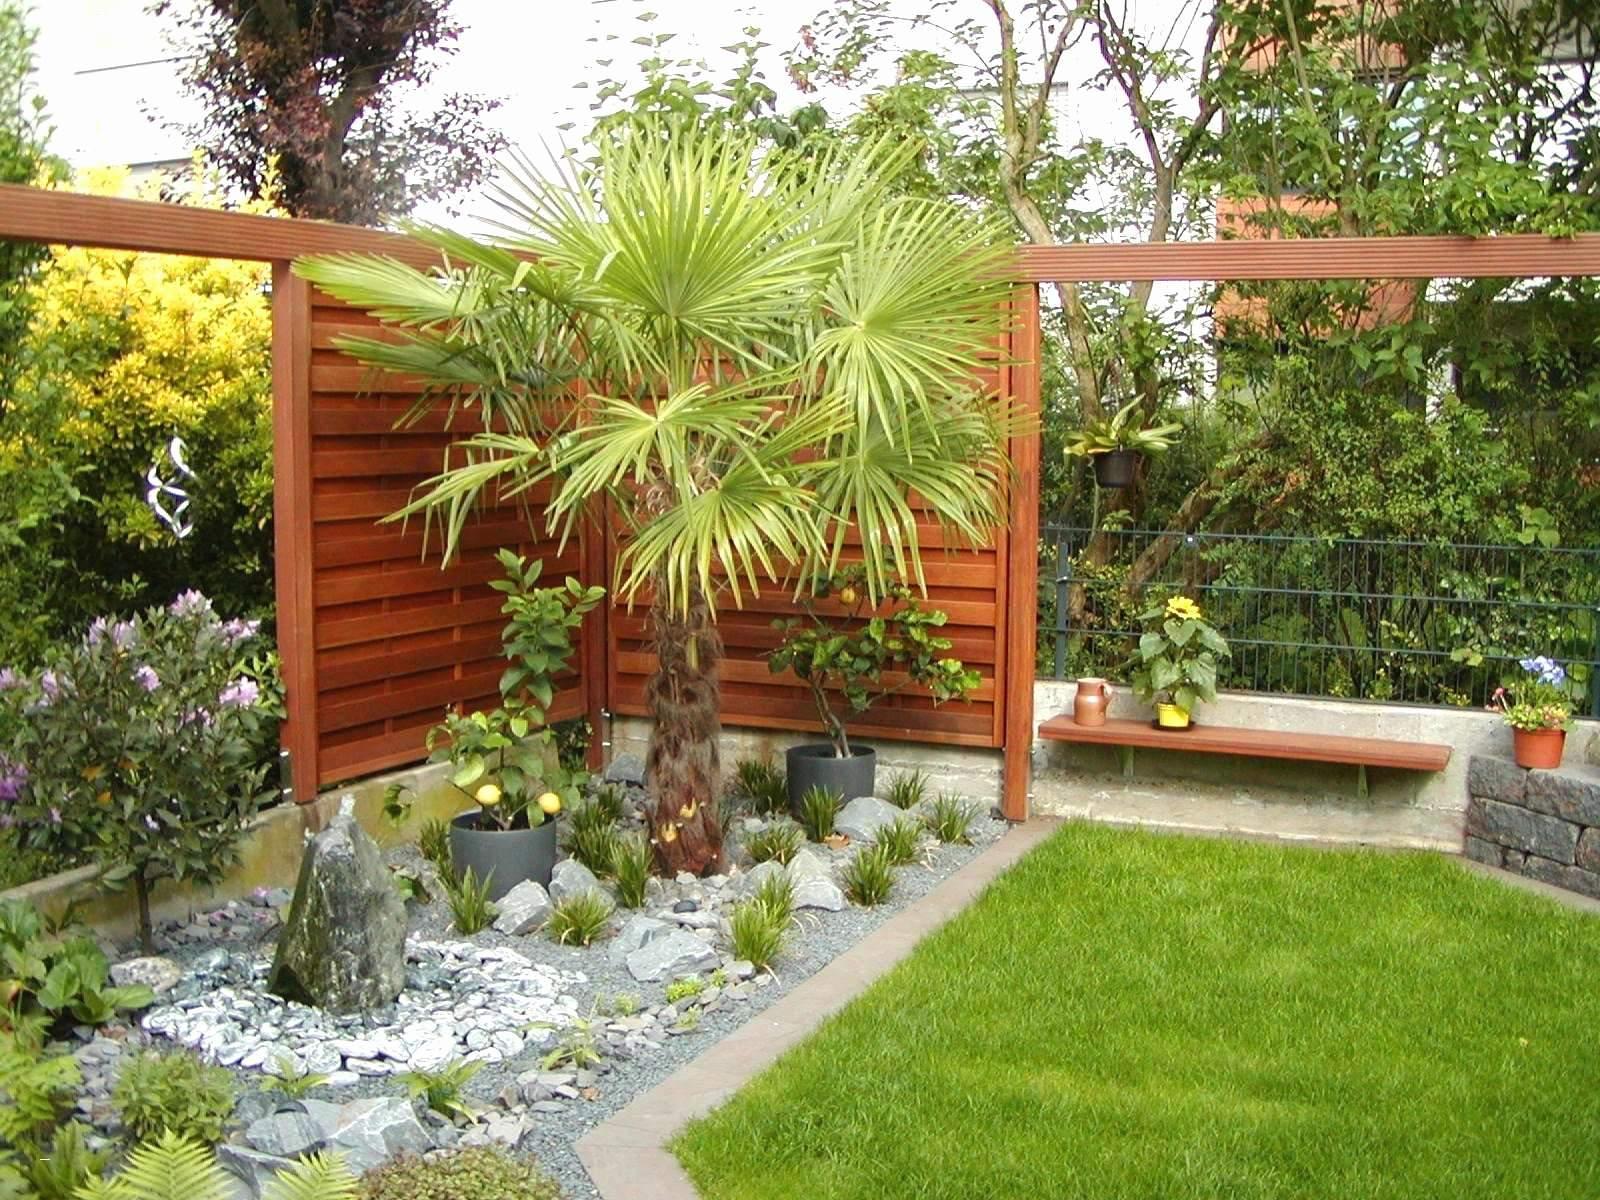 bonsai garden picture of 42 neu bonsai garten stock of bonsai garden